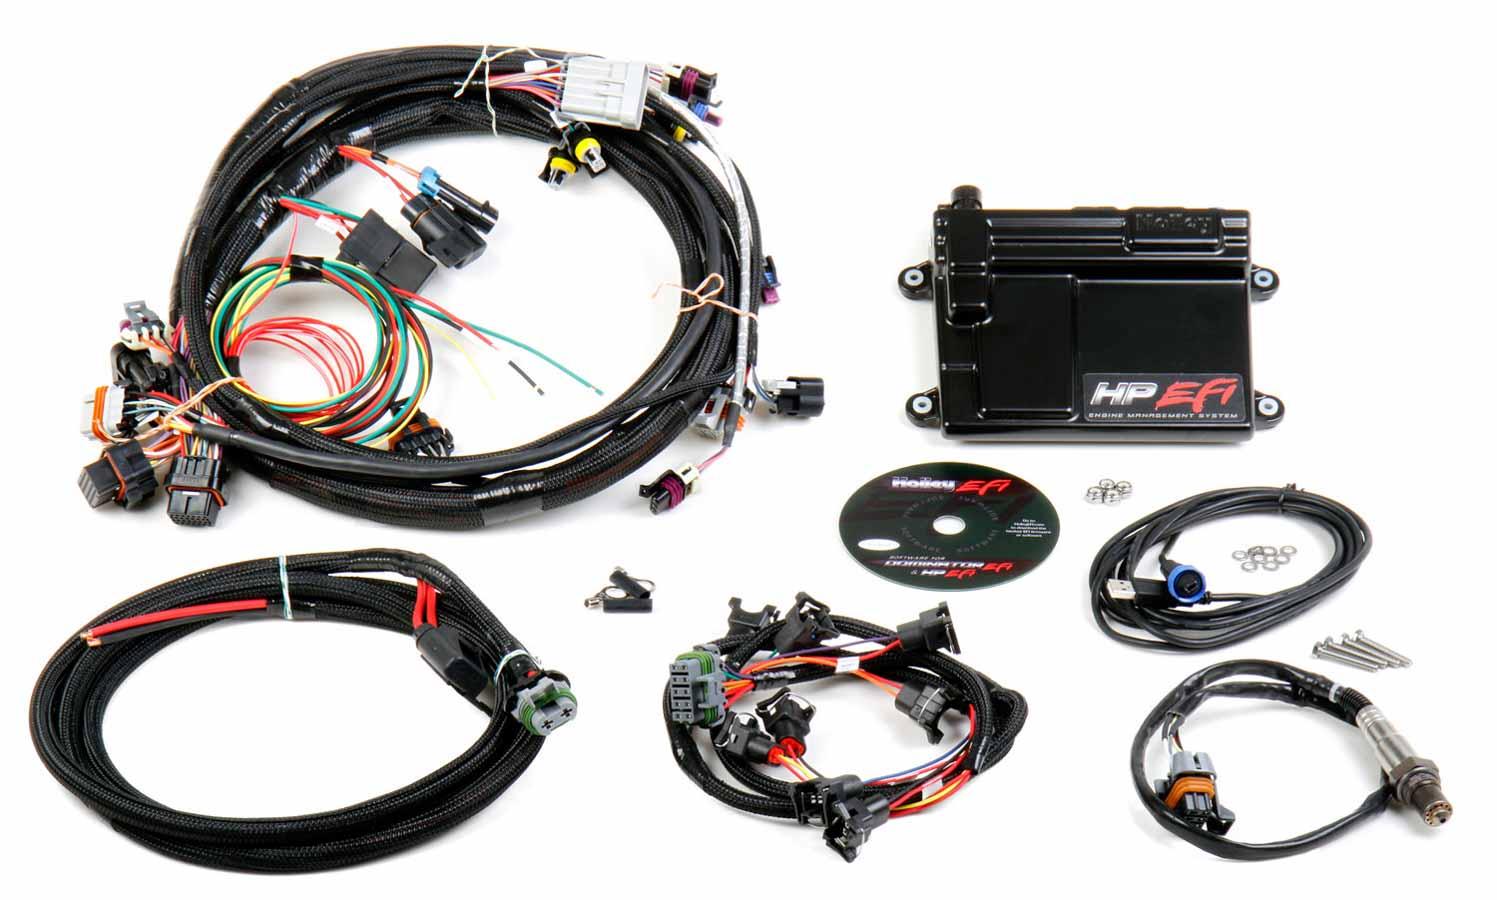 holley ecu & wiring harness ls1 p/n - 550-602